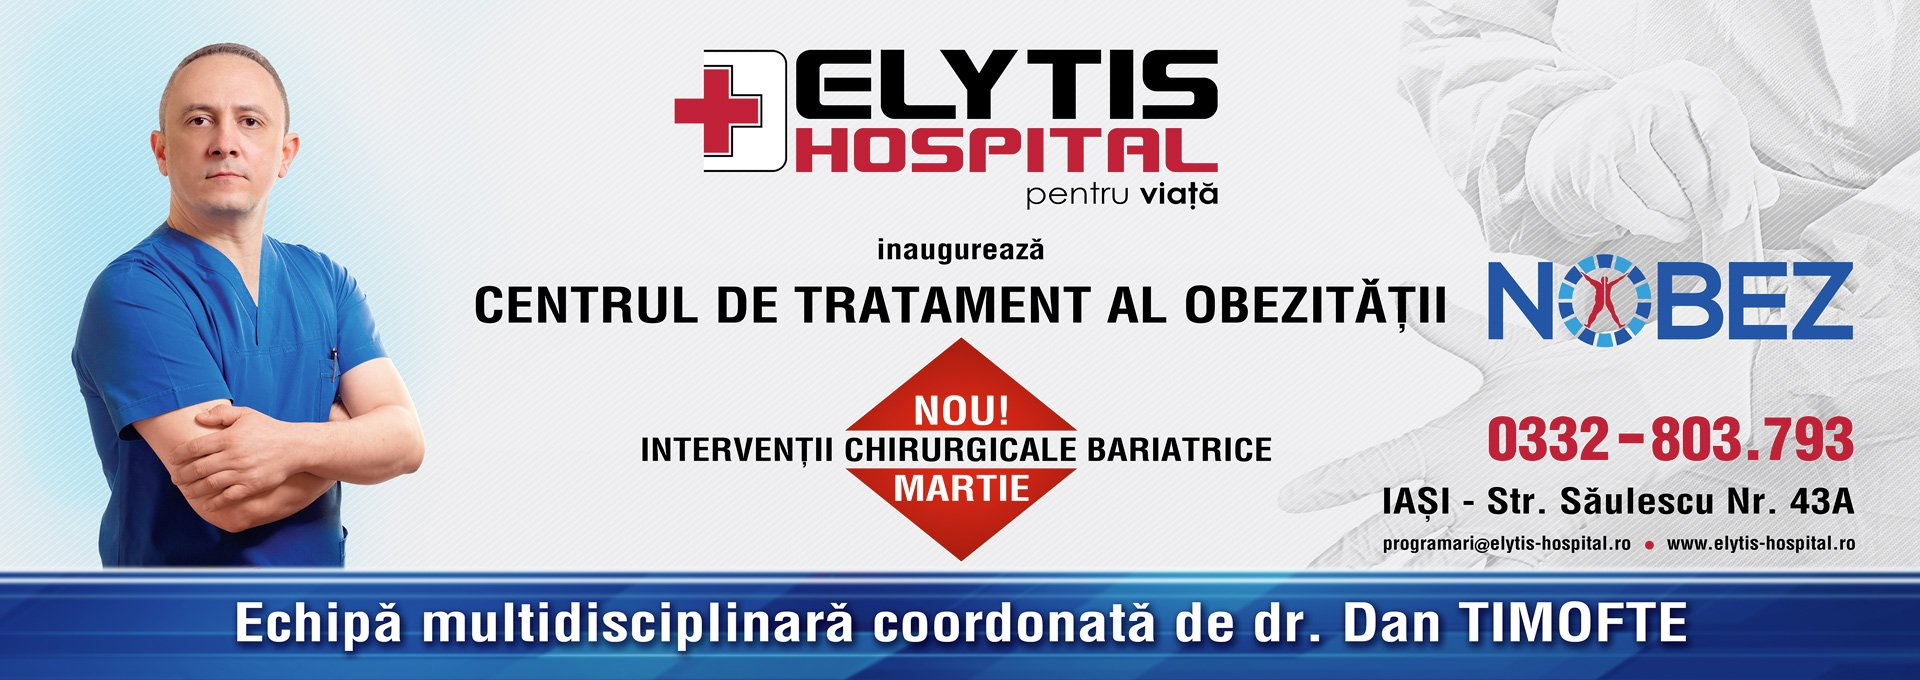 Chirurgia-Obezitatii-www-21.03